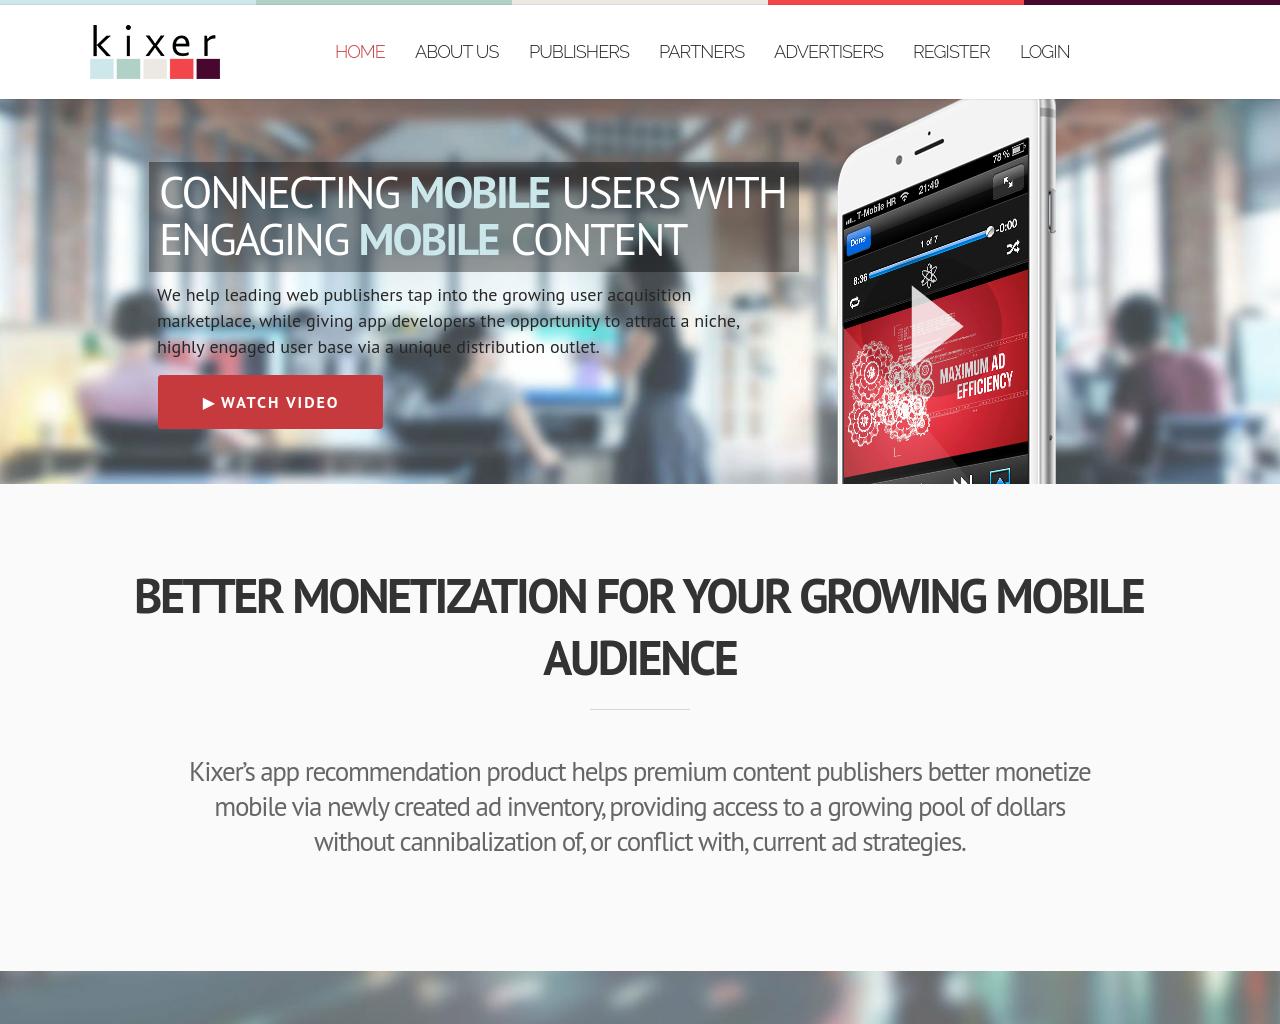 Kixer-Advertising-Reviews-Pricing